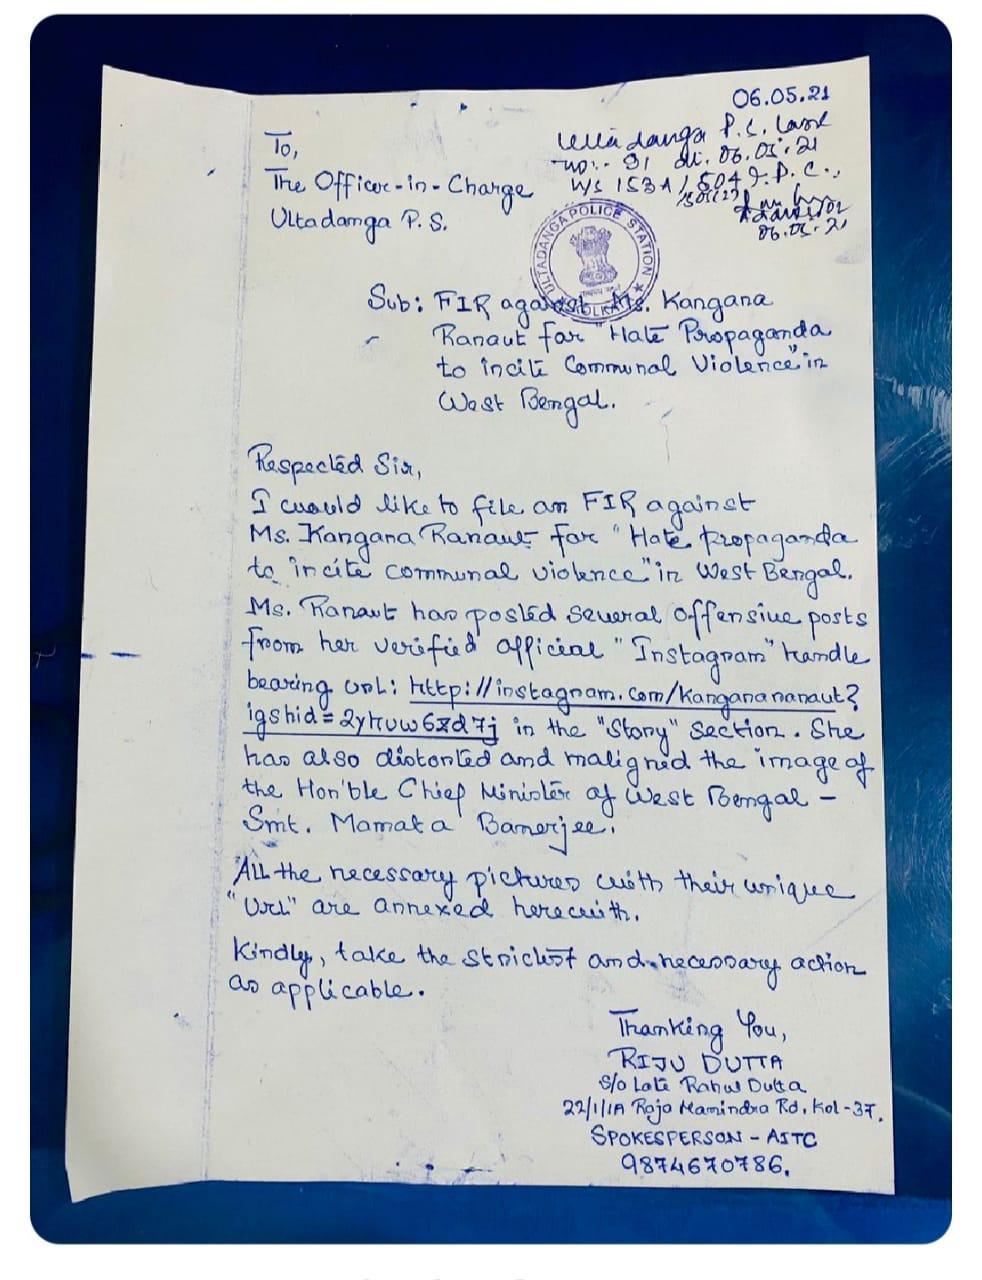 Complaint against Kangana Ranaut by Dr. Riju Dutta